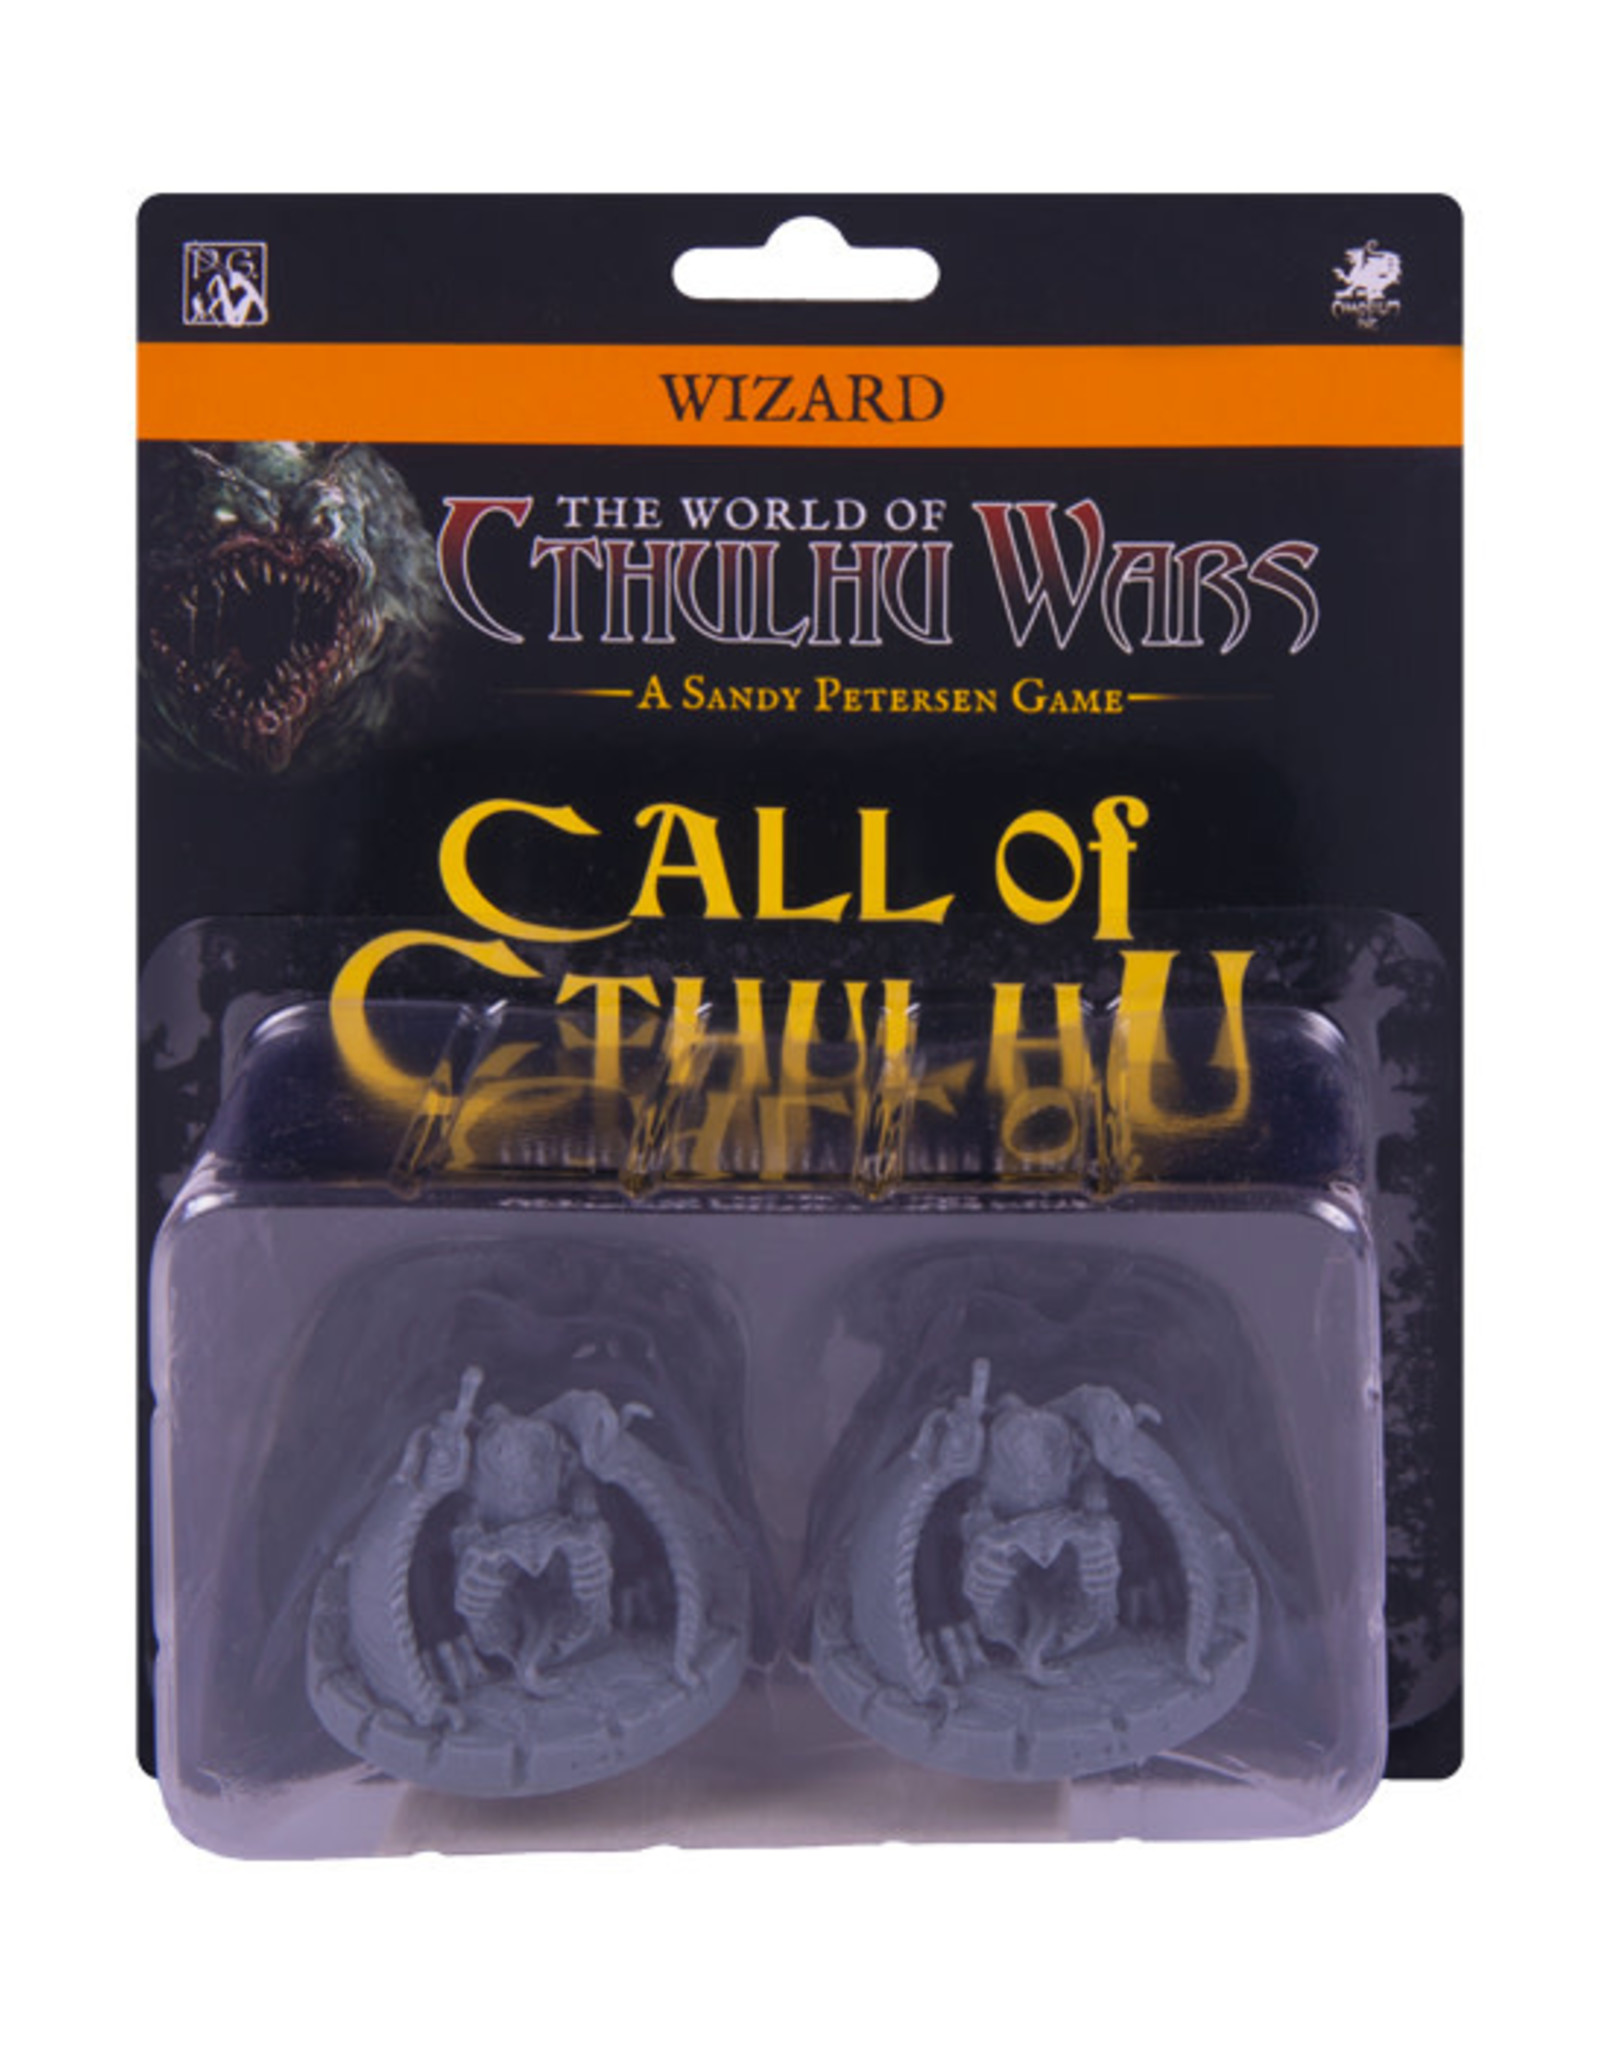 Call of Cthulhu: Miniature - Wizard